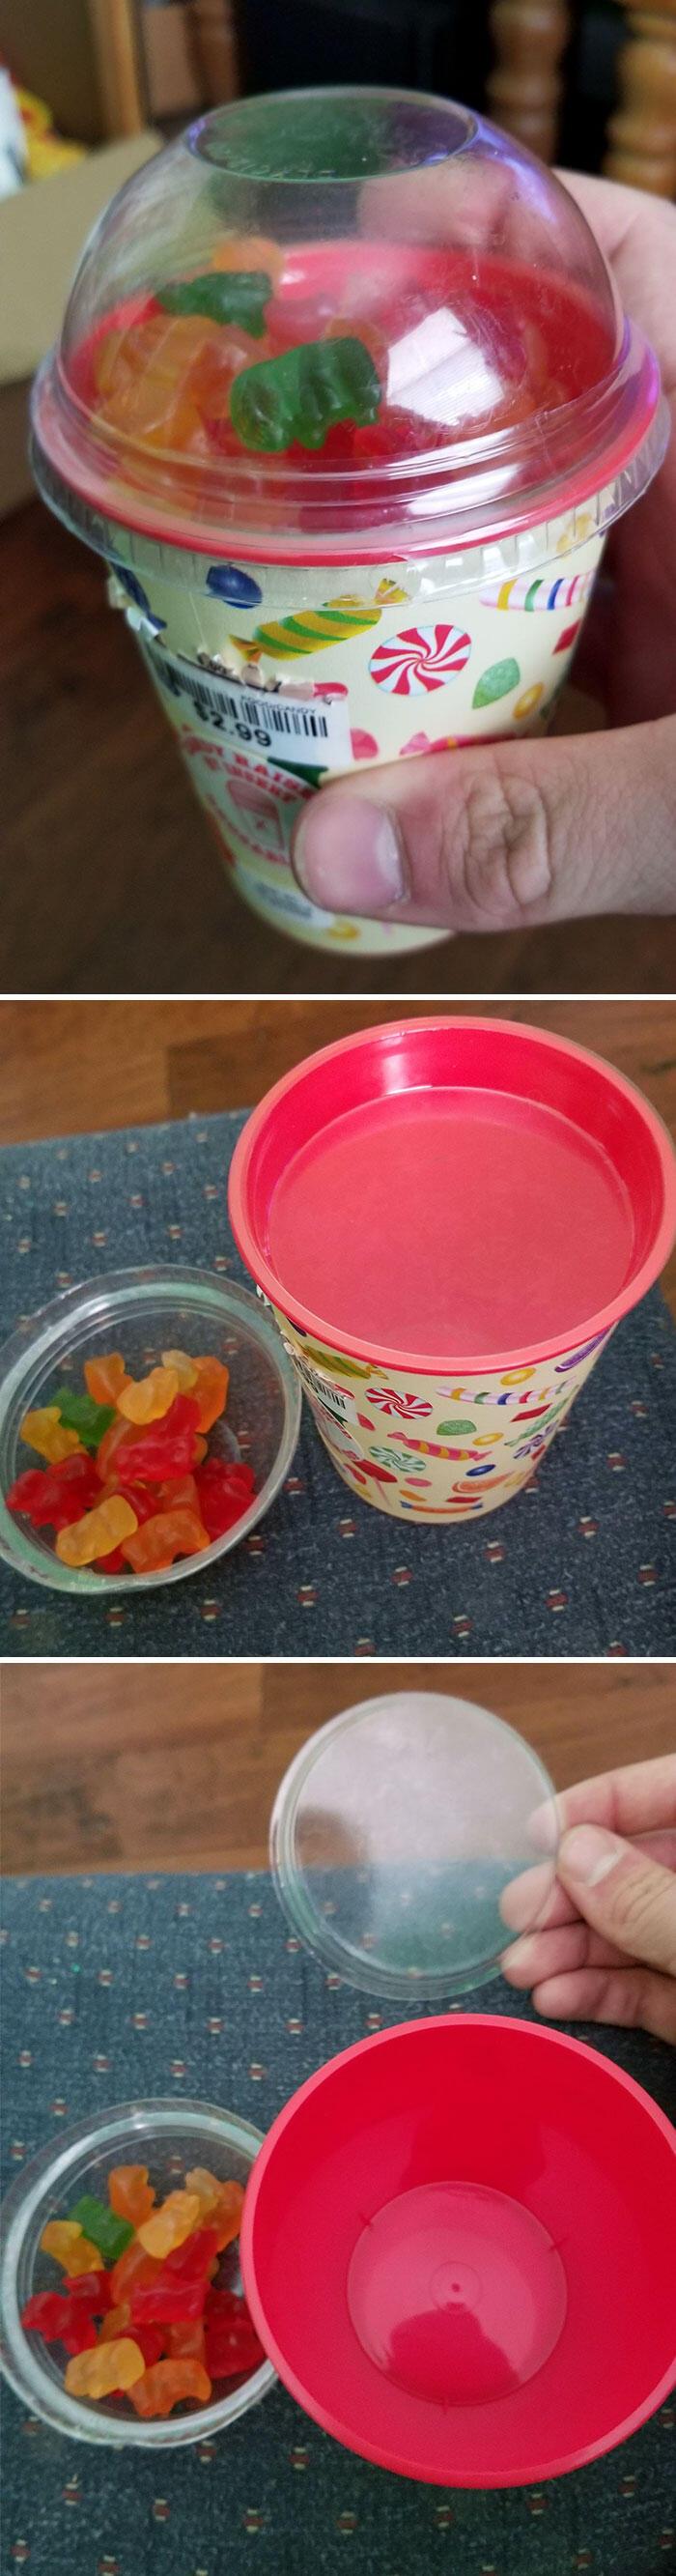 Keterlaluan, 12 Kemasan Makanan Ini Justru Bikin Pembeli Rugi!